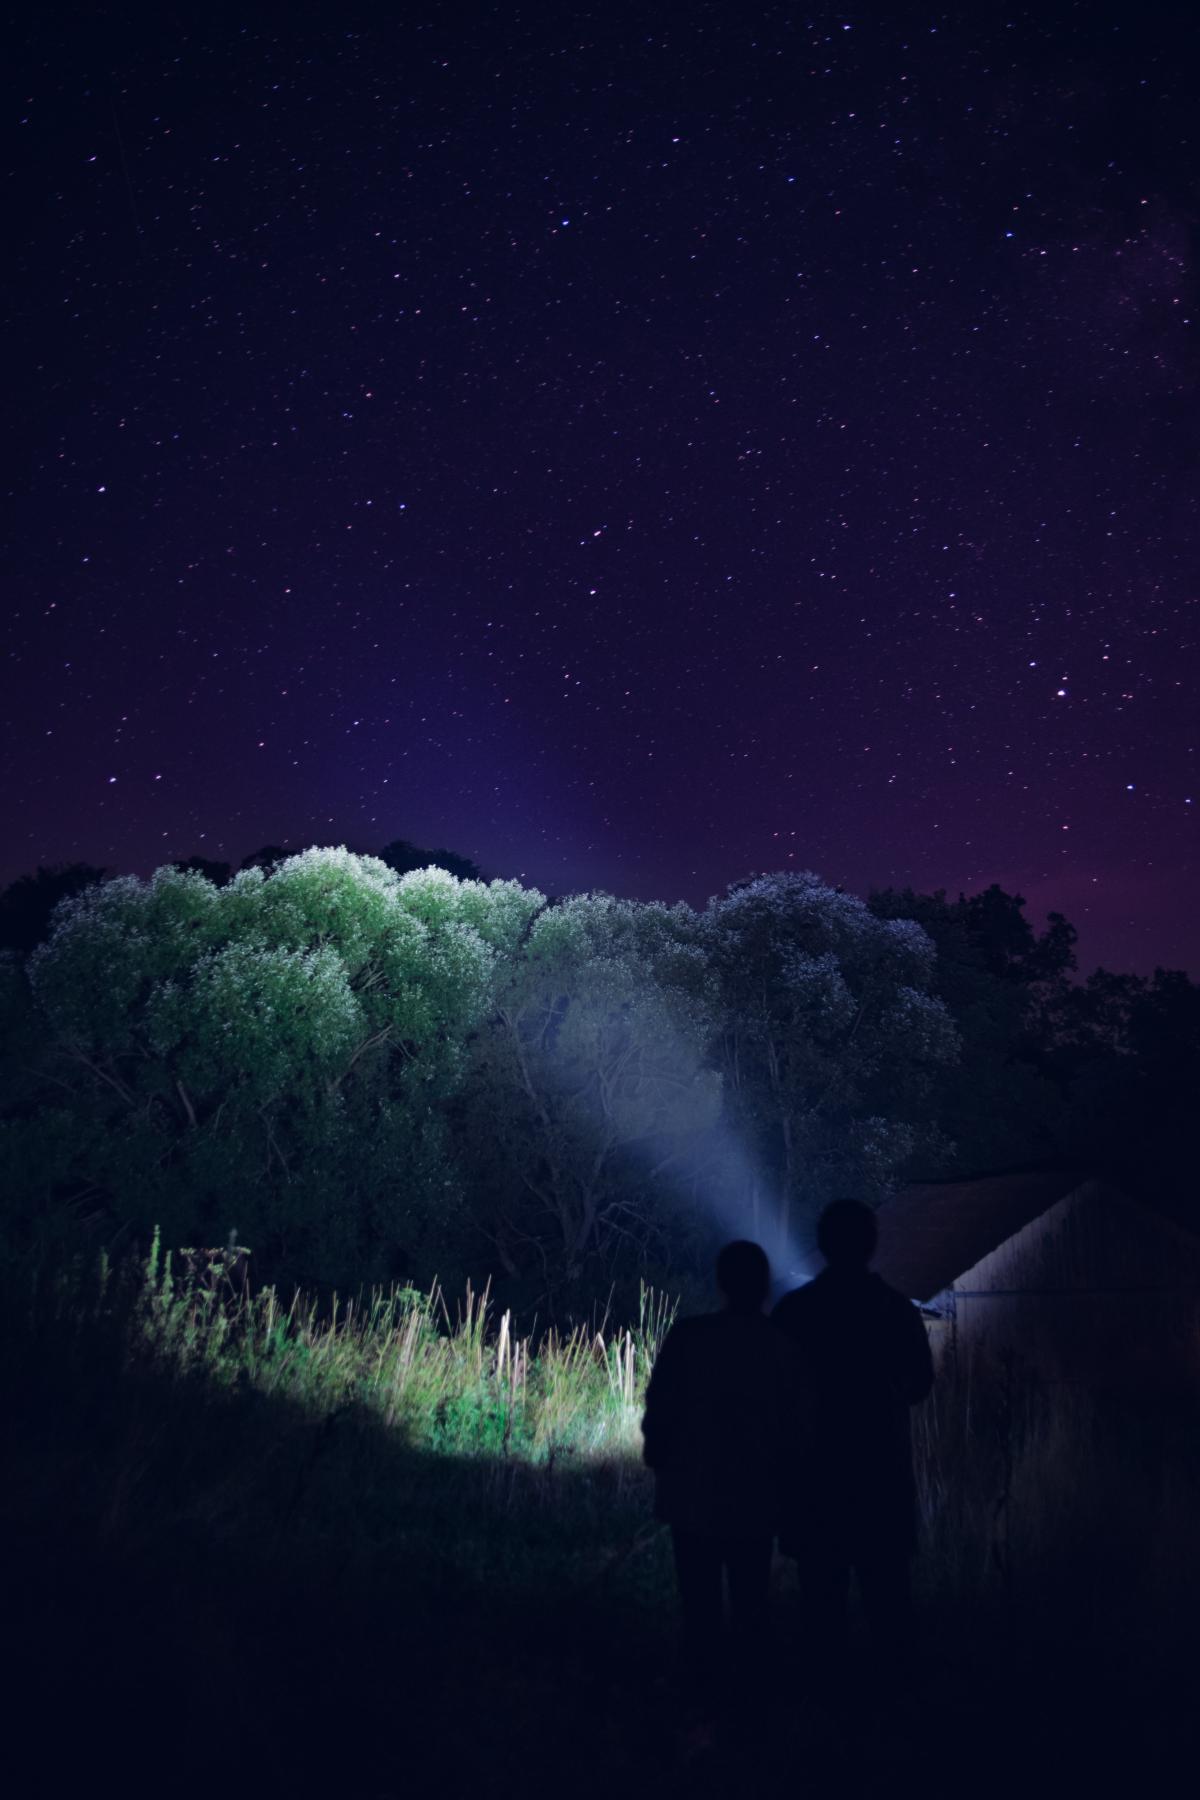 Star Celestial body Sky